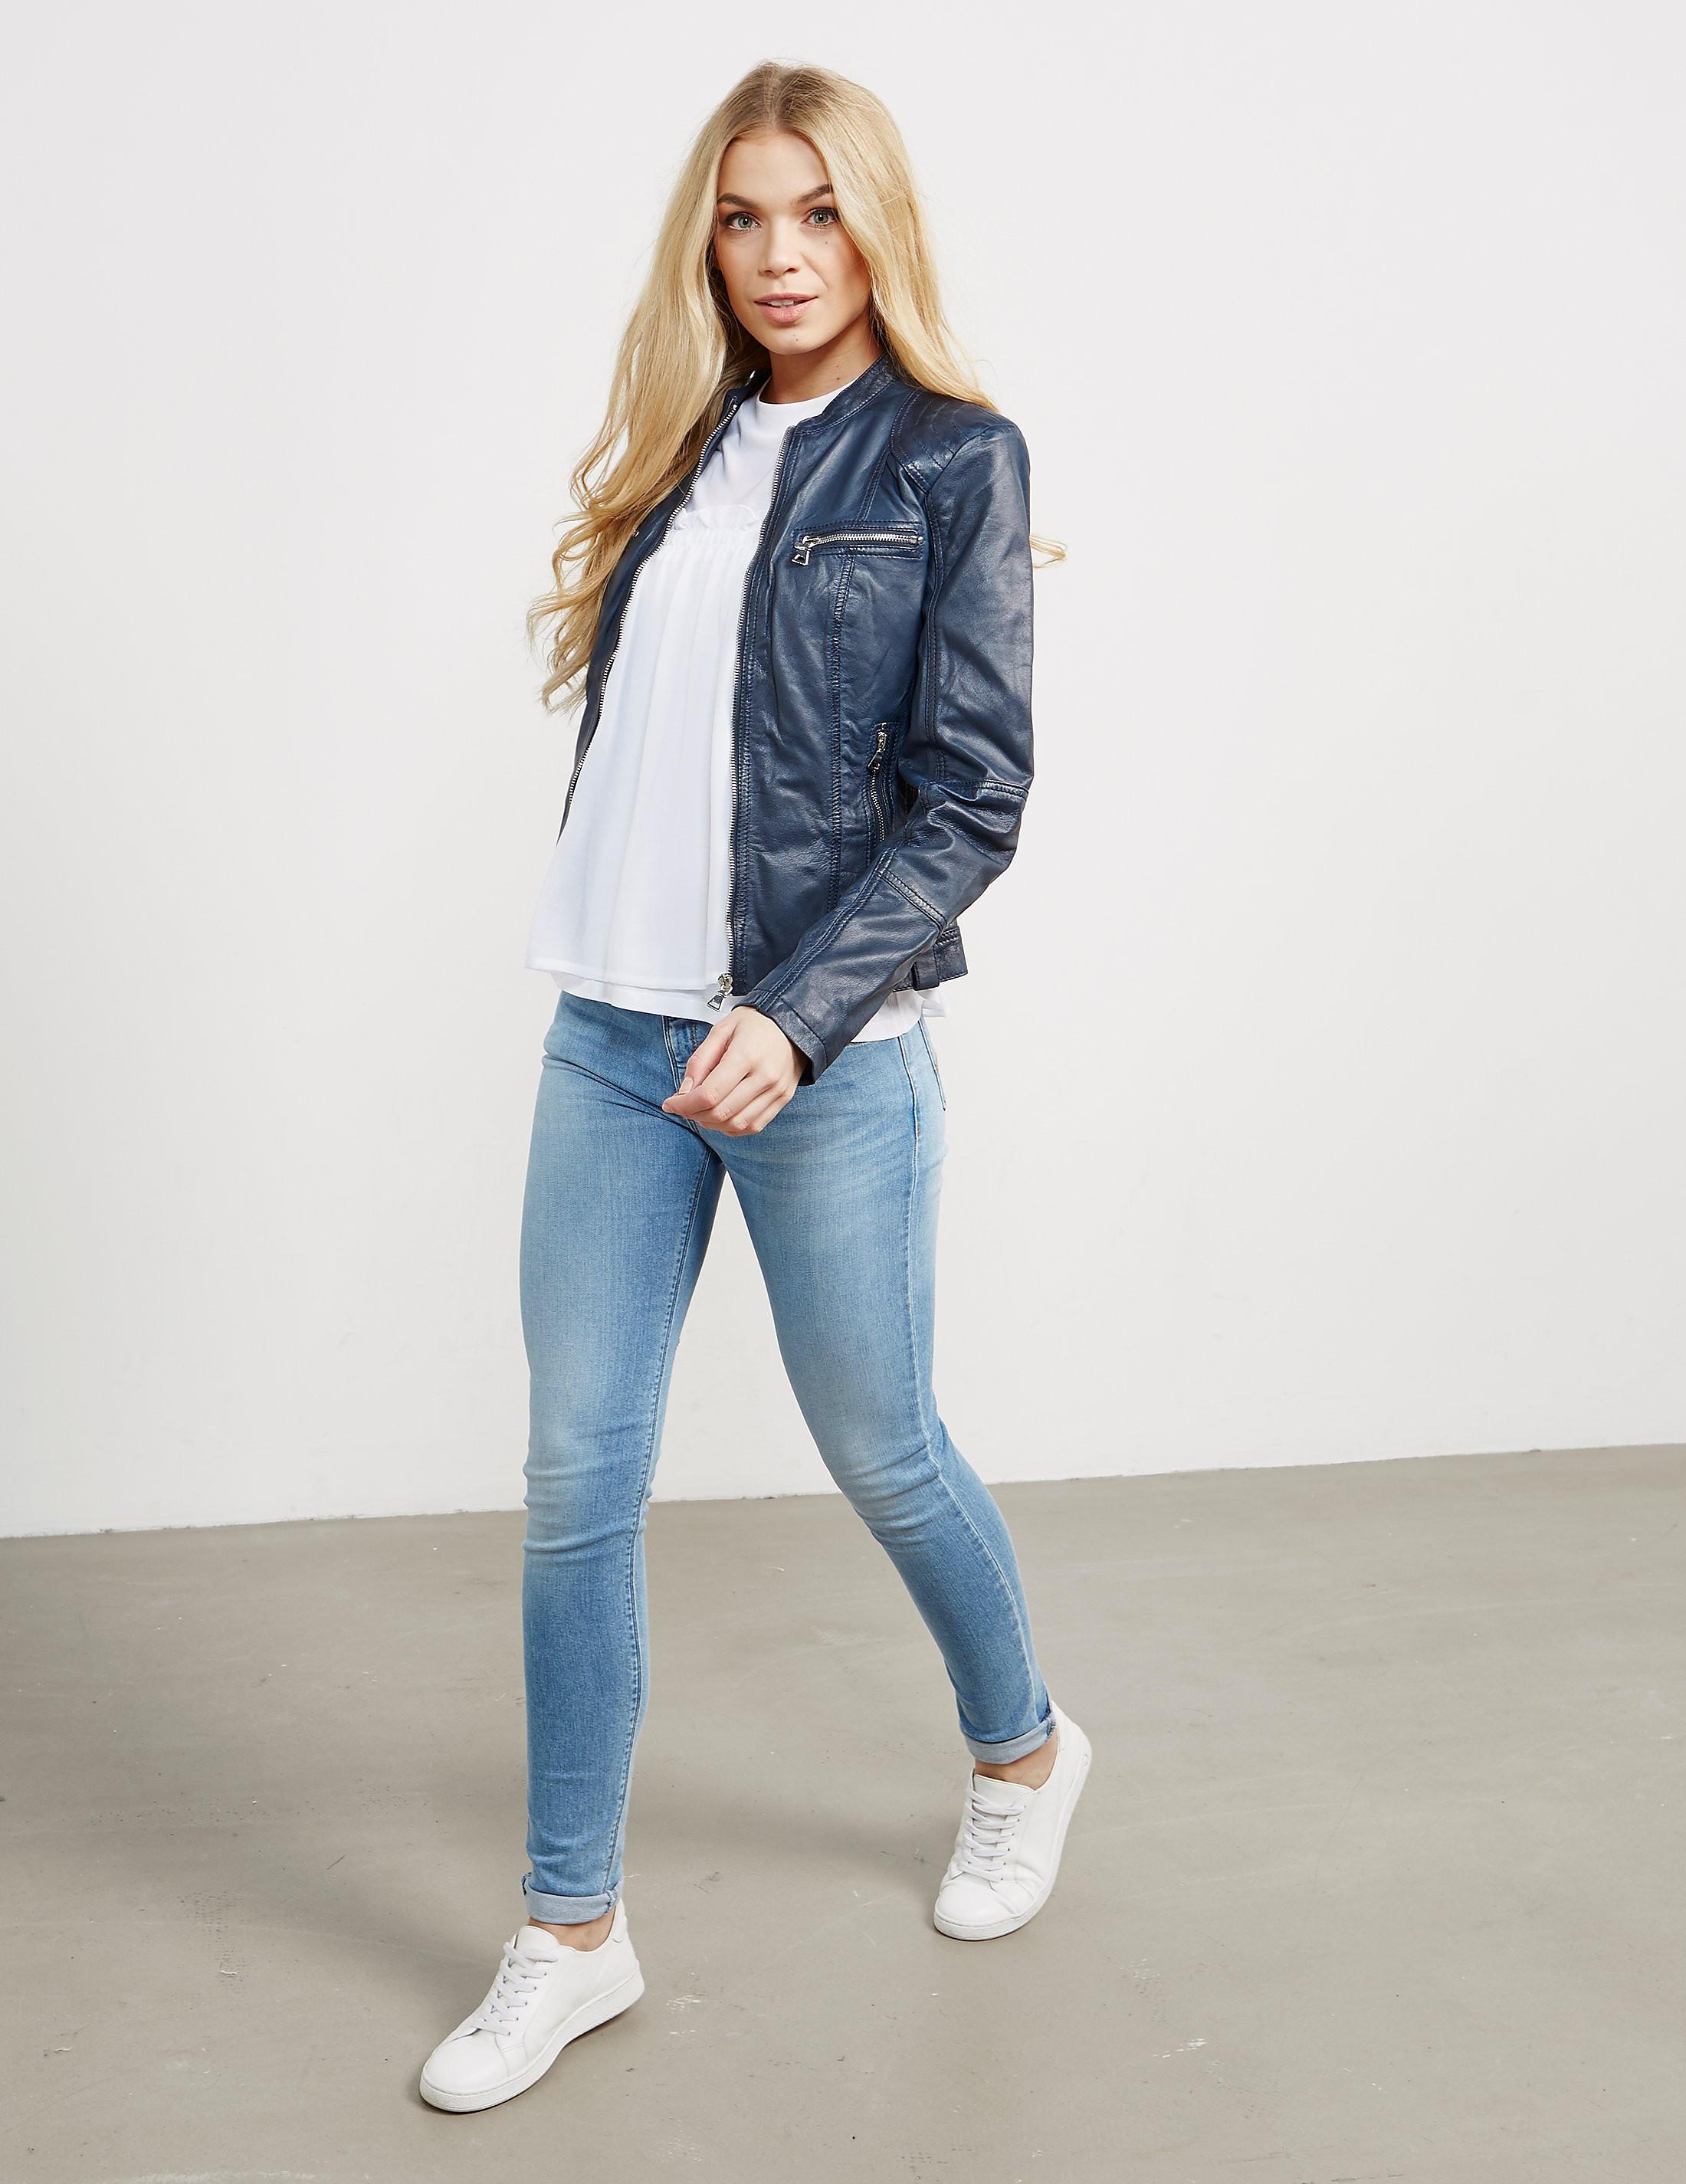 Rino & Pelle Collarless Leather Jacket